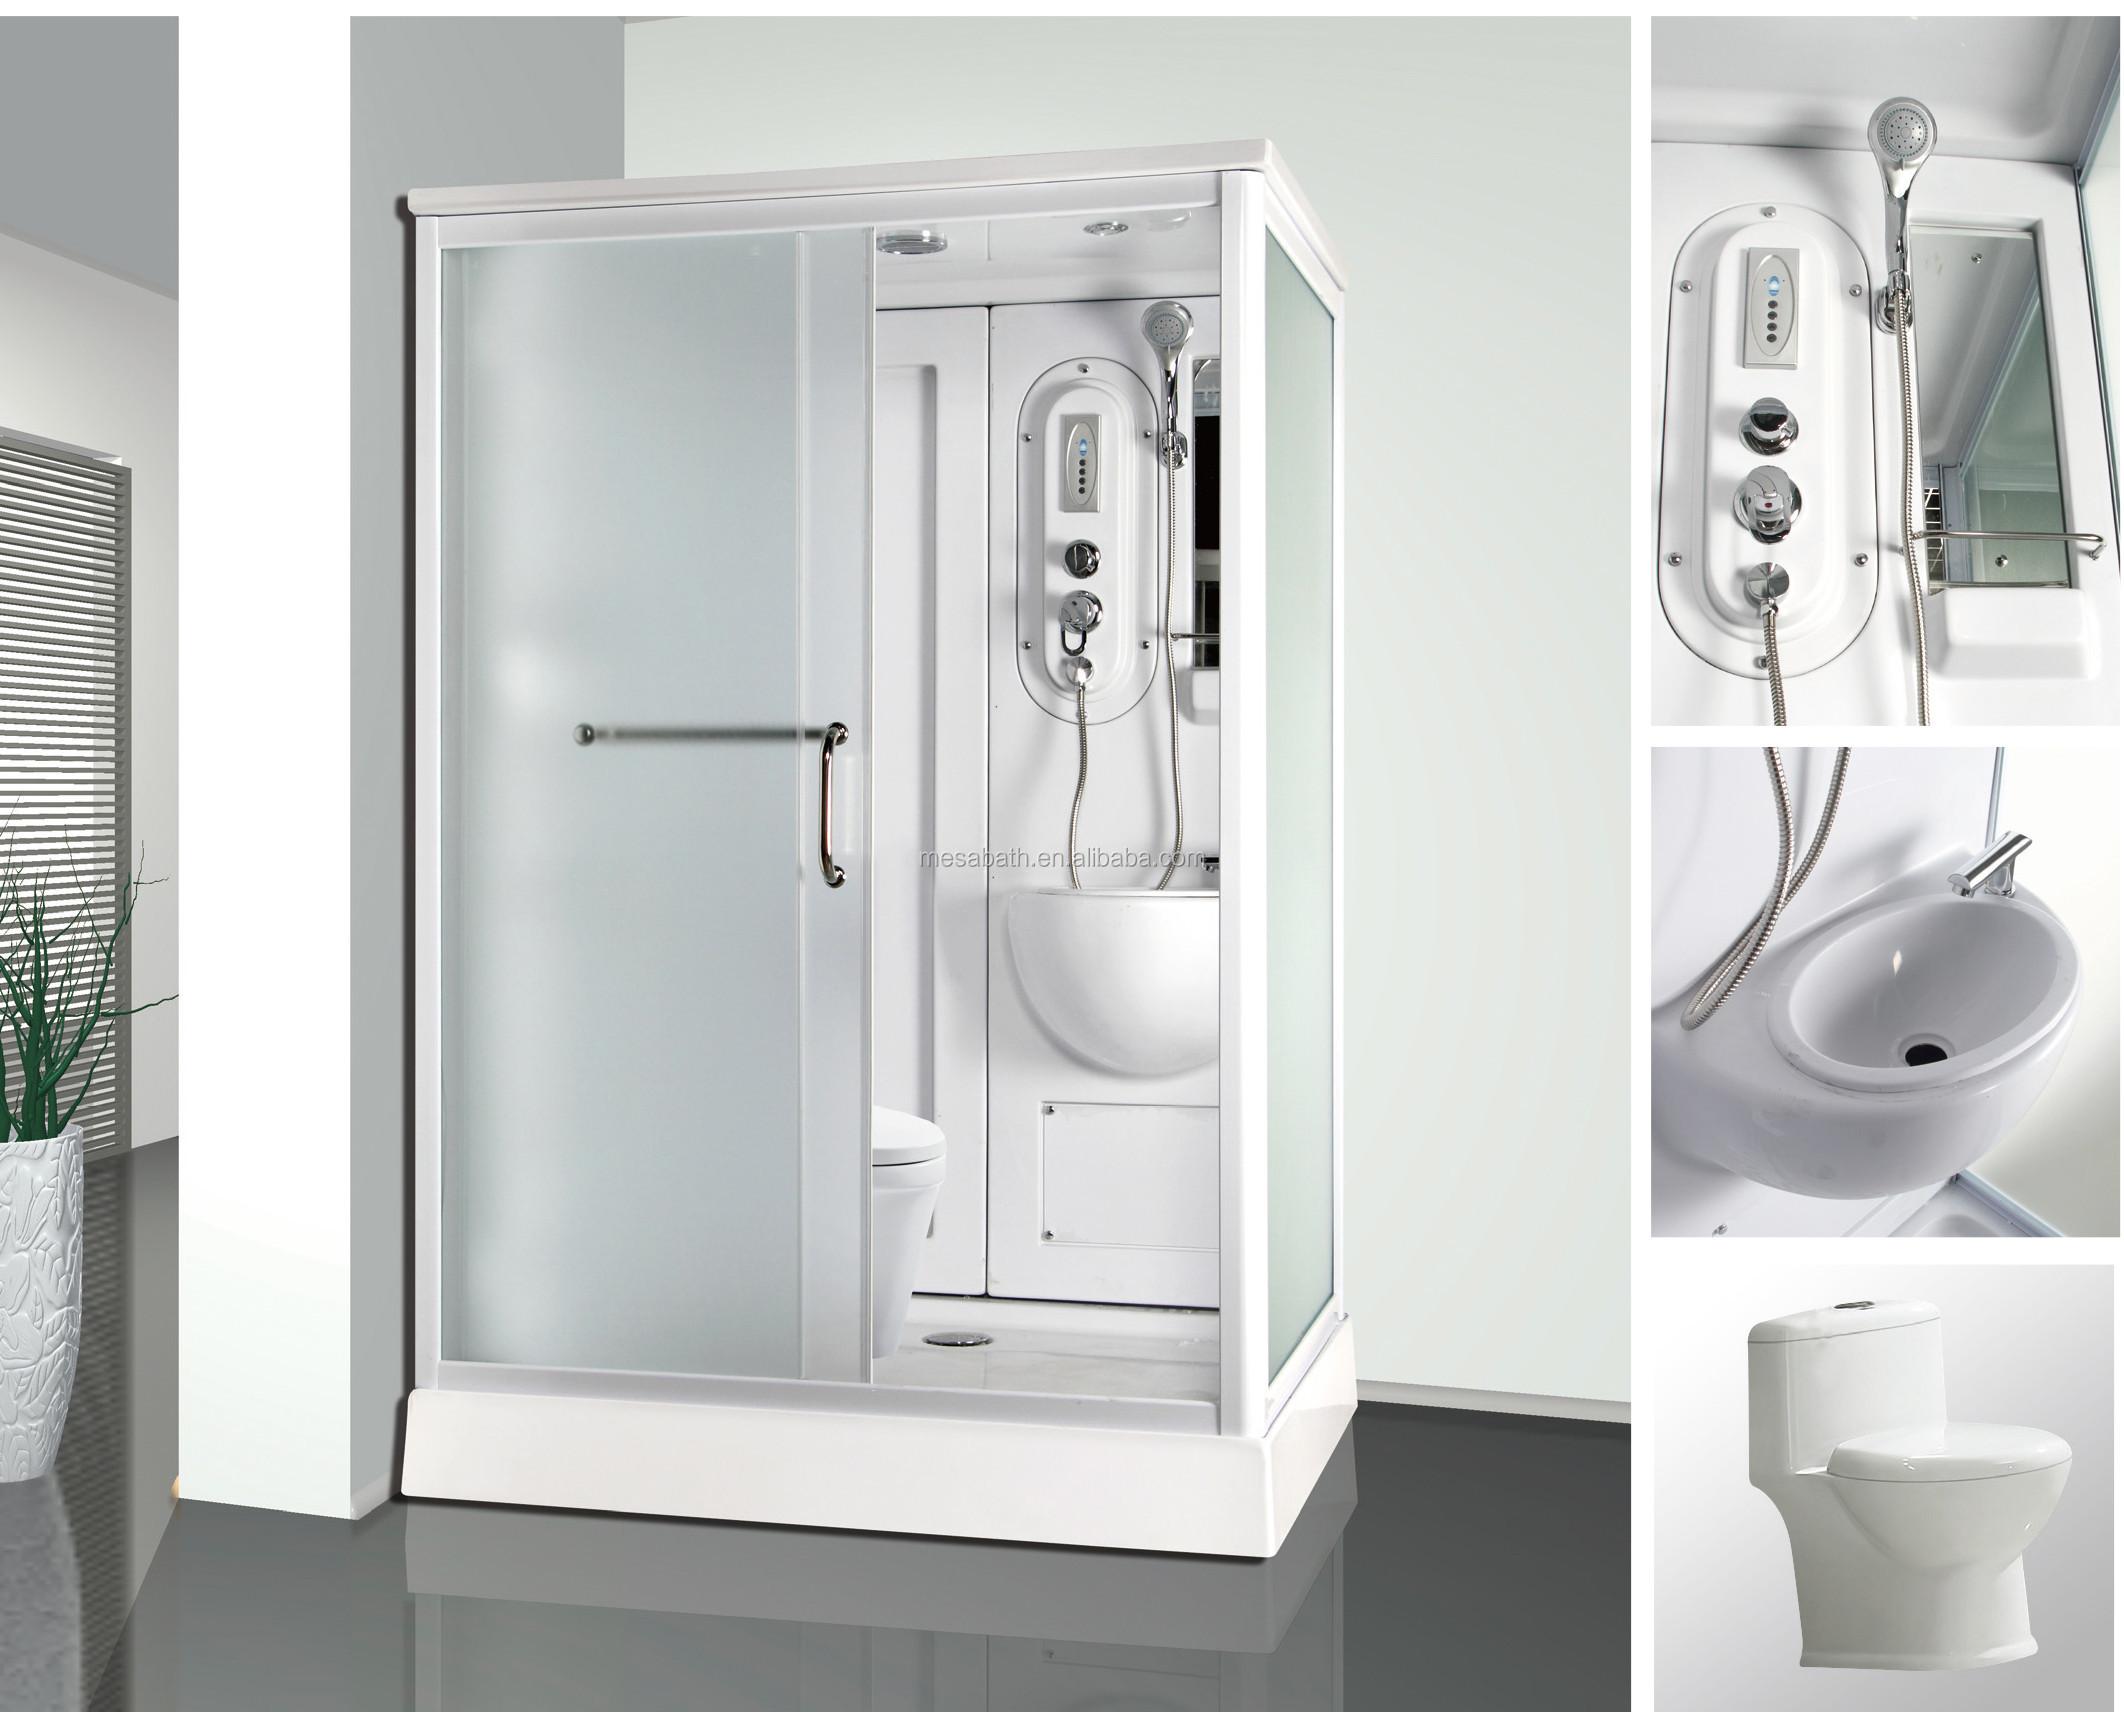 portable bathroom shower cabin toilet sink combo buy shower toilet combo shower combo portable bathroom product on alibaba com